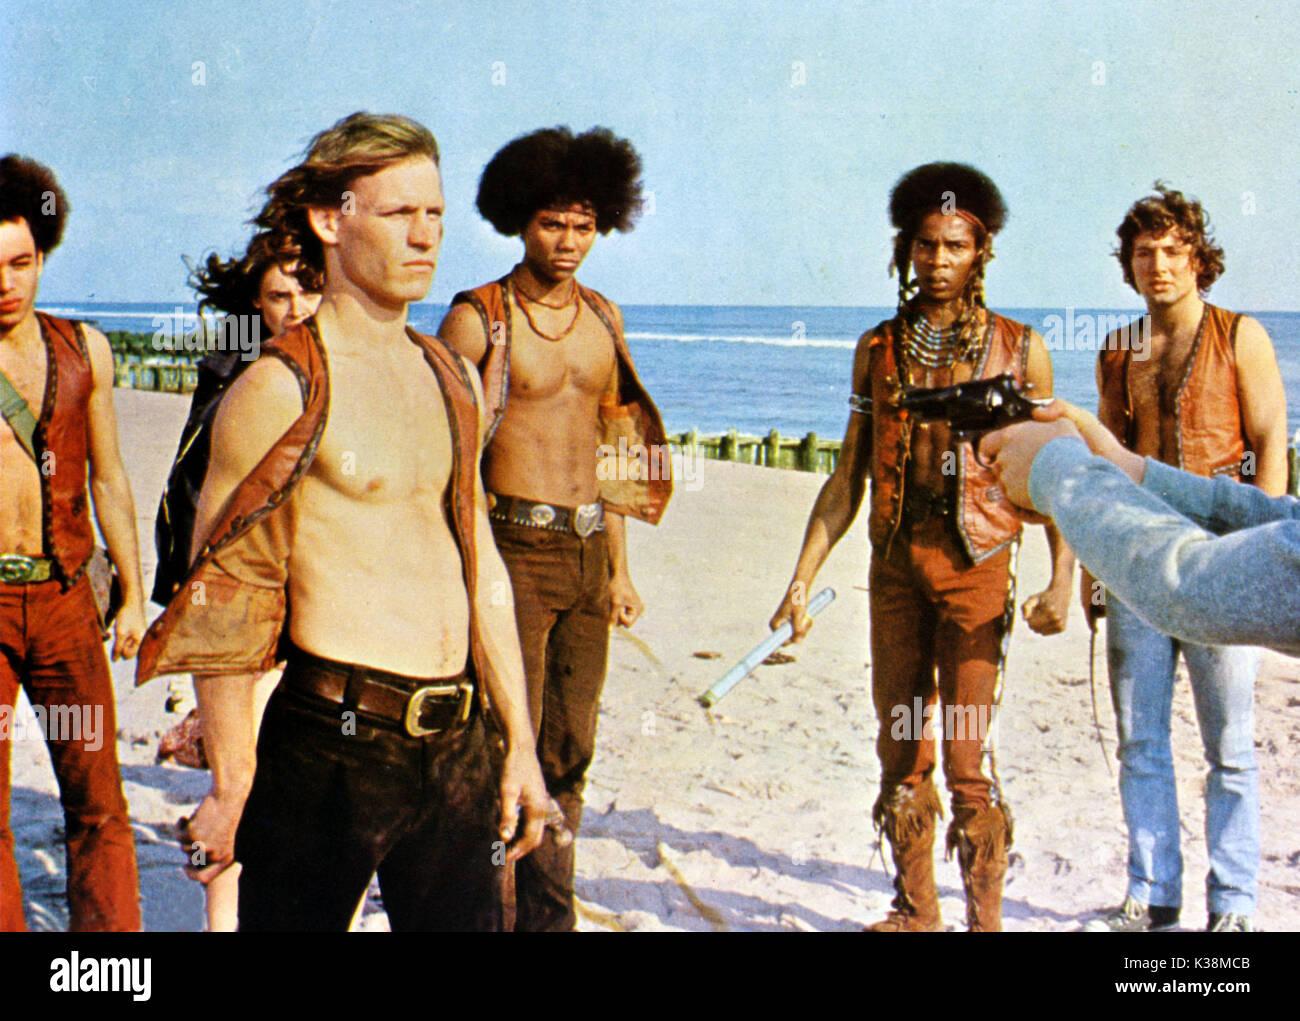 THE WARRIORS [?], DEBORAH VAN VALKENBURGH, MICHAEL BECK, BRIAN TYLER, DAVID HARRIS, [?] - Stock Image